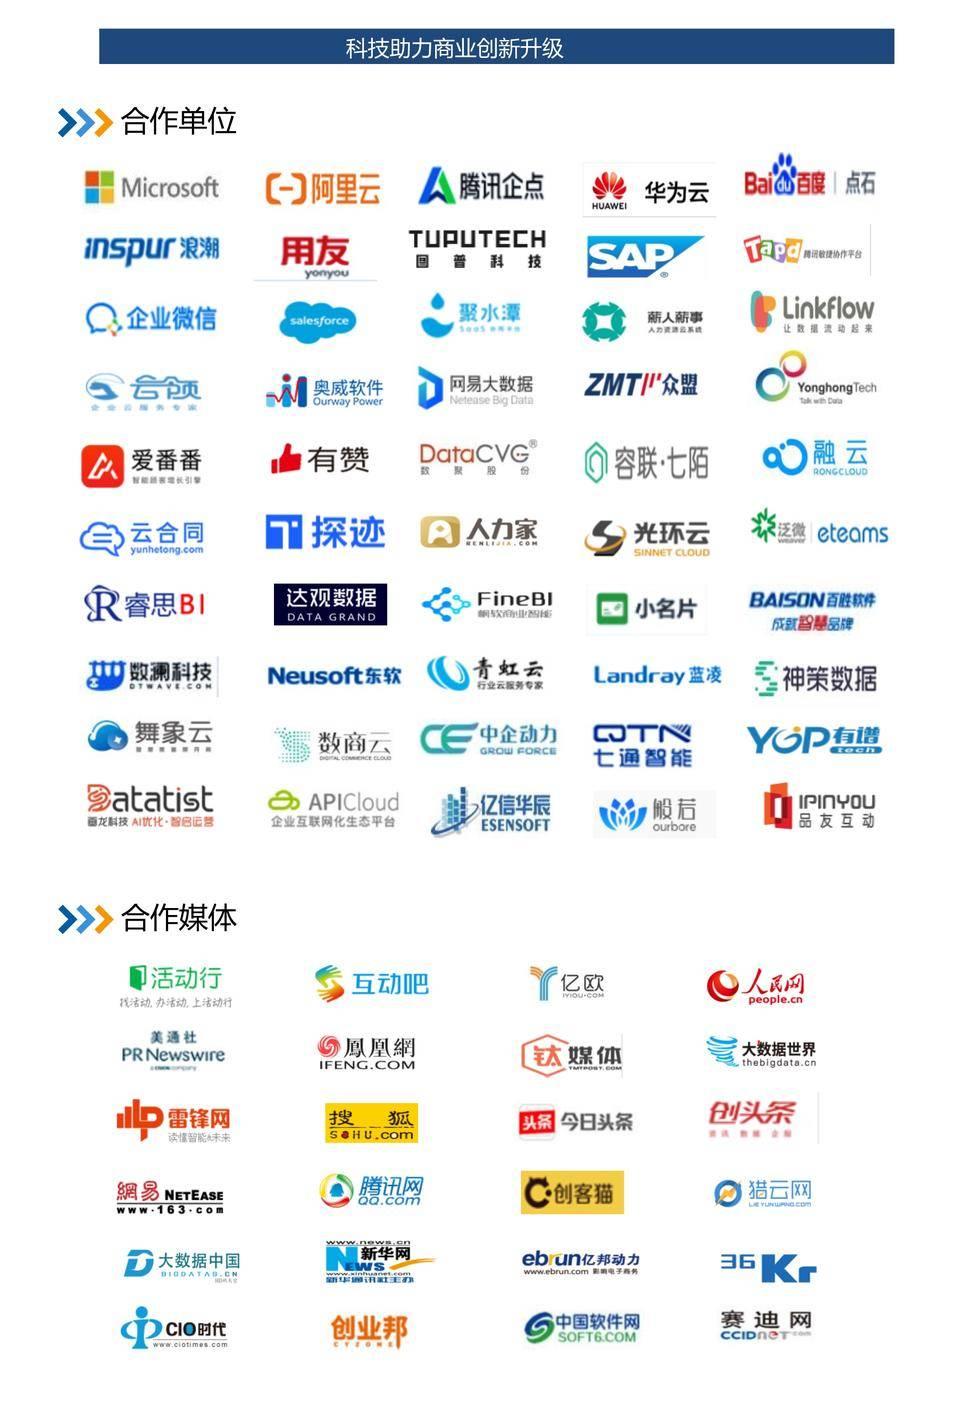 BIChina2019中国商业智能创新大会_2.jpg